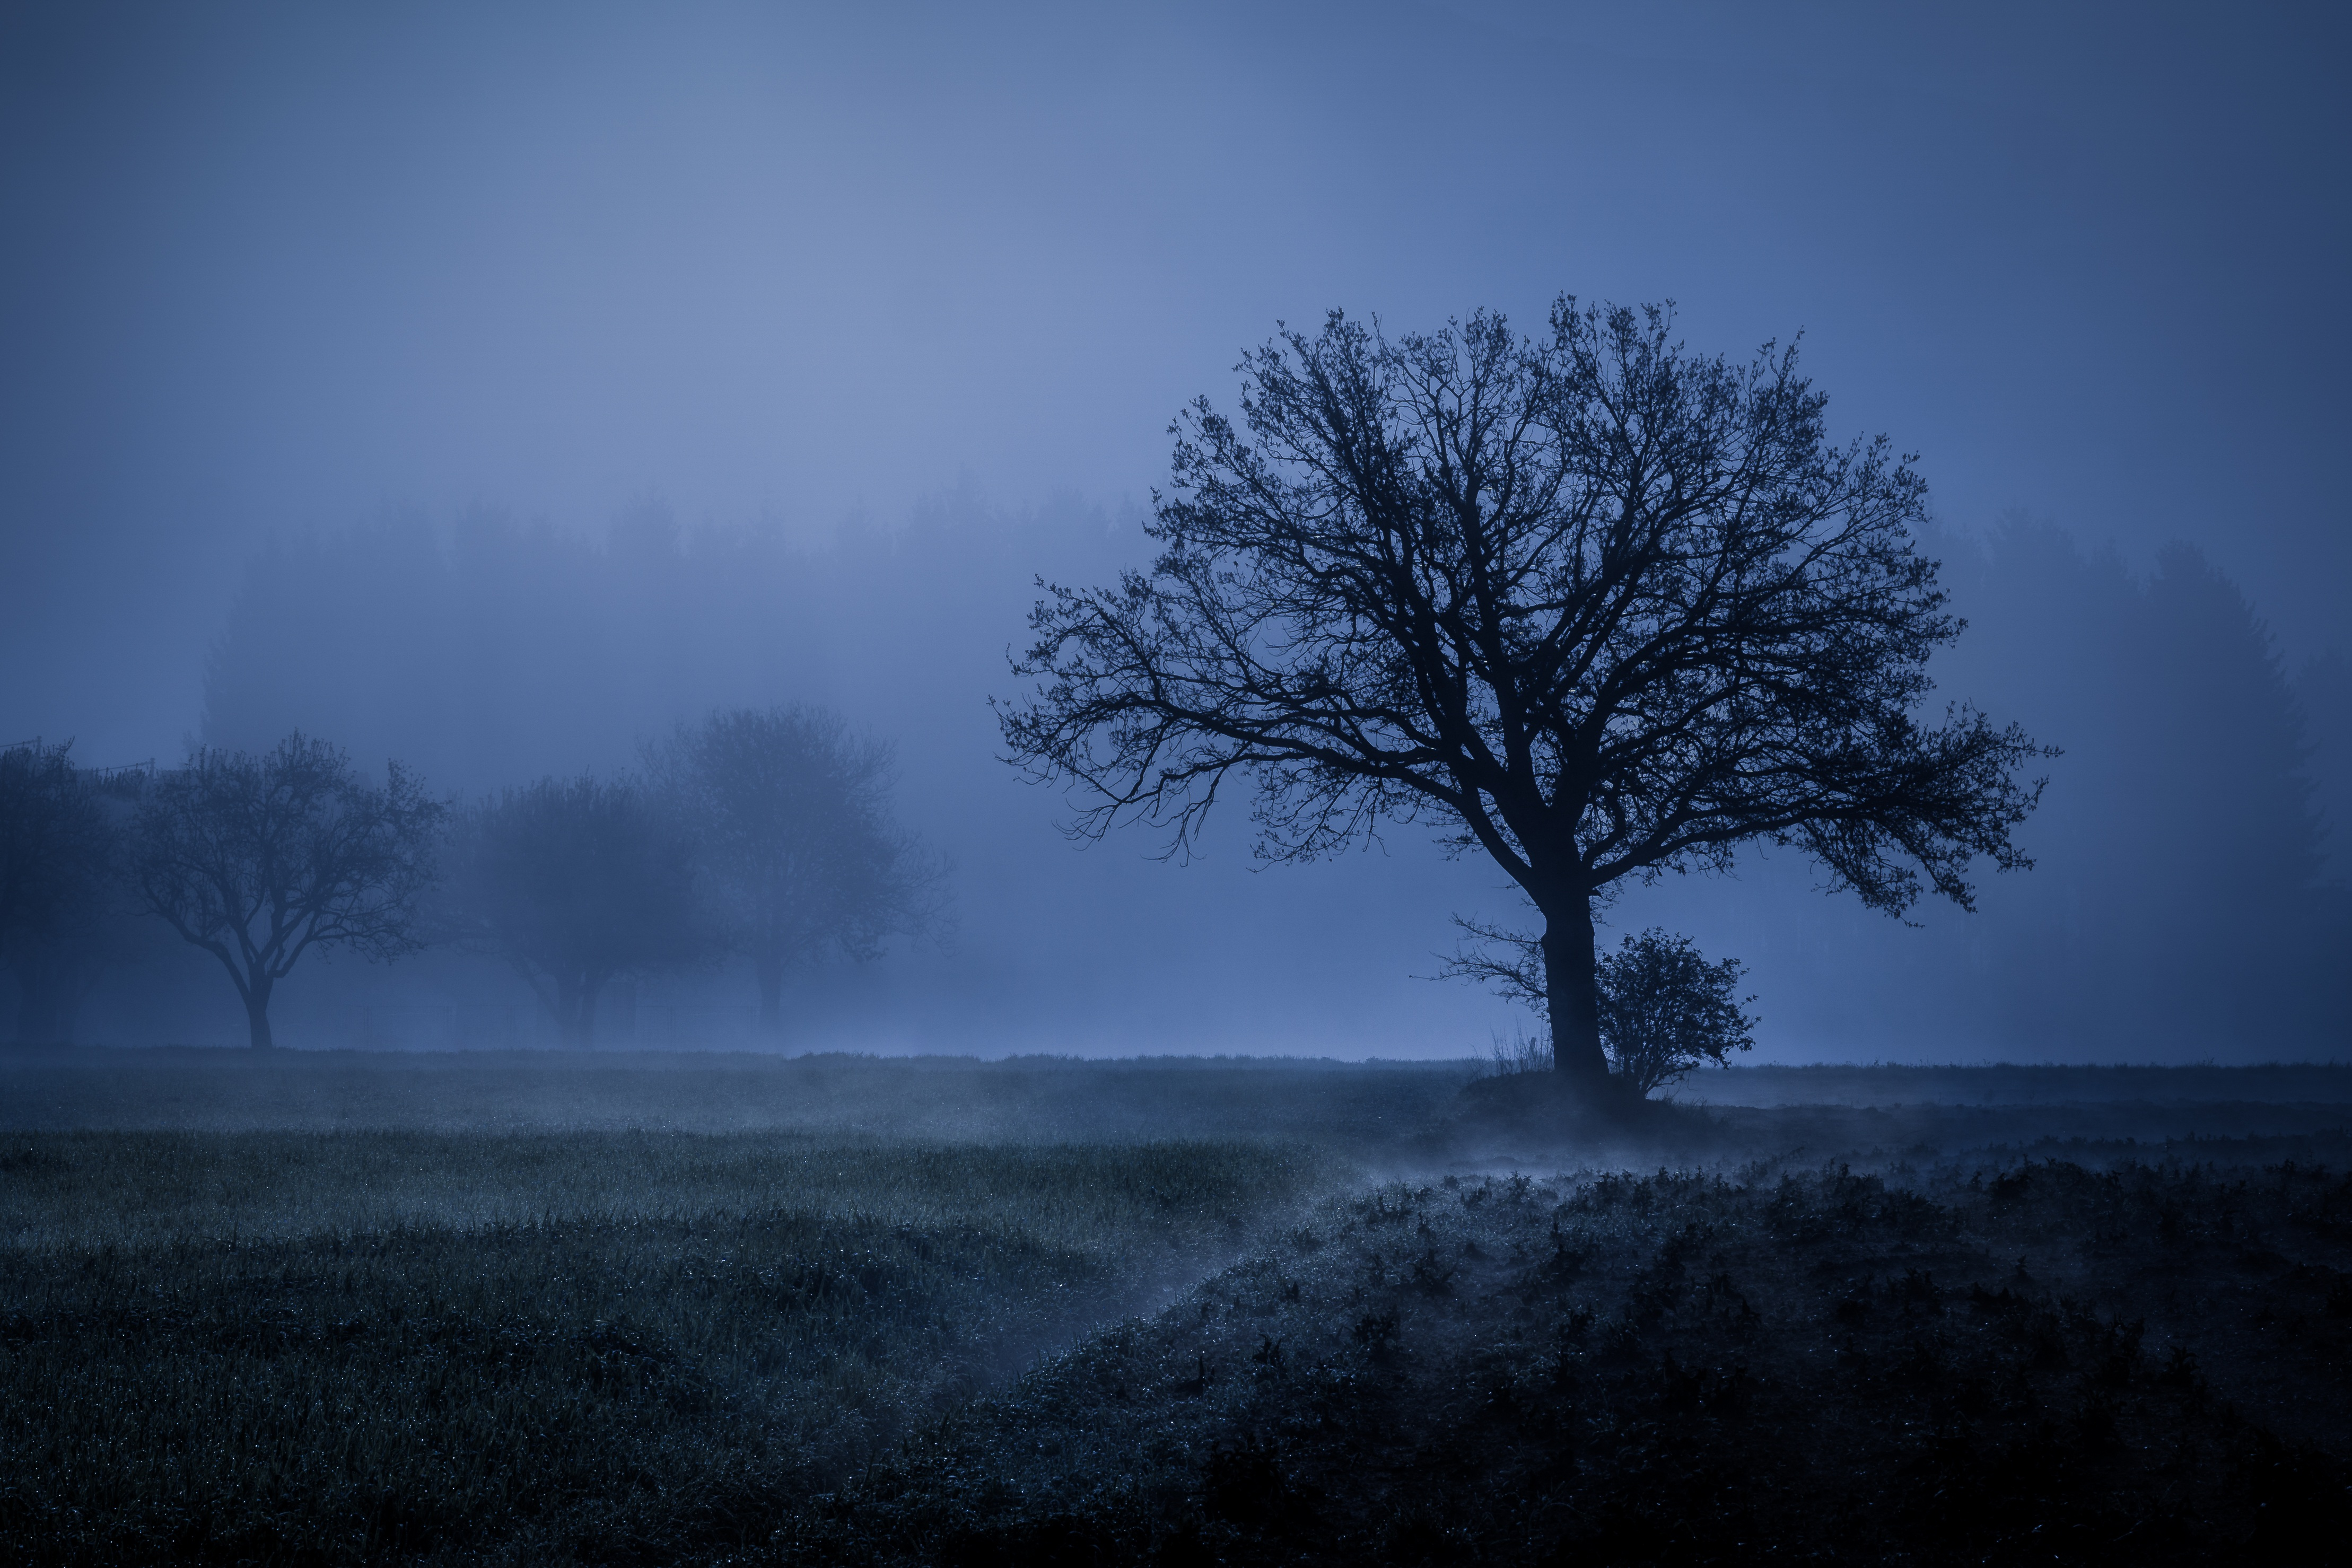 1366x768 Field Fog Trees Blue Weather Cold 4k 5k 1366x768